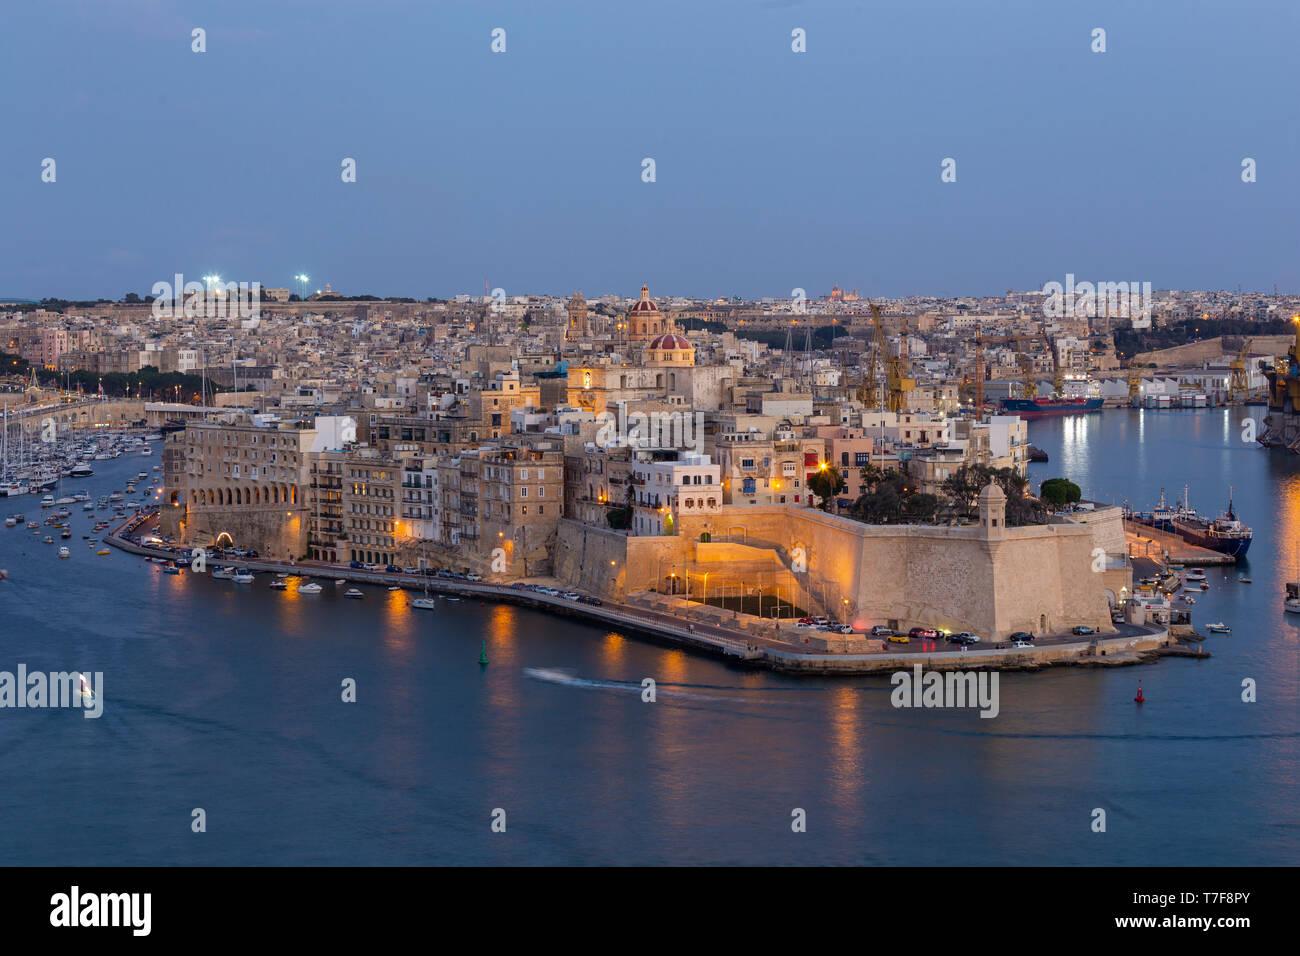 Malta, Malta, Valletta, View of Senglea from Upper Barraka Gardens - Stock Image